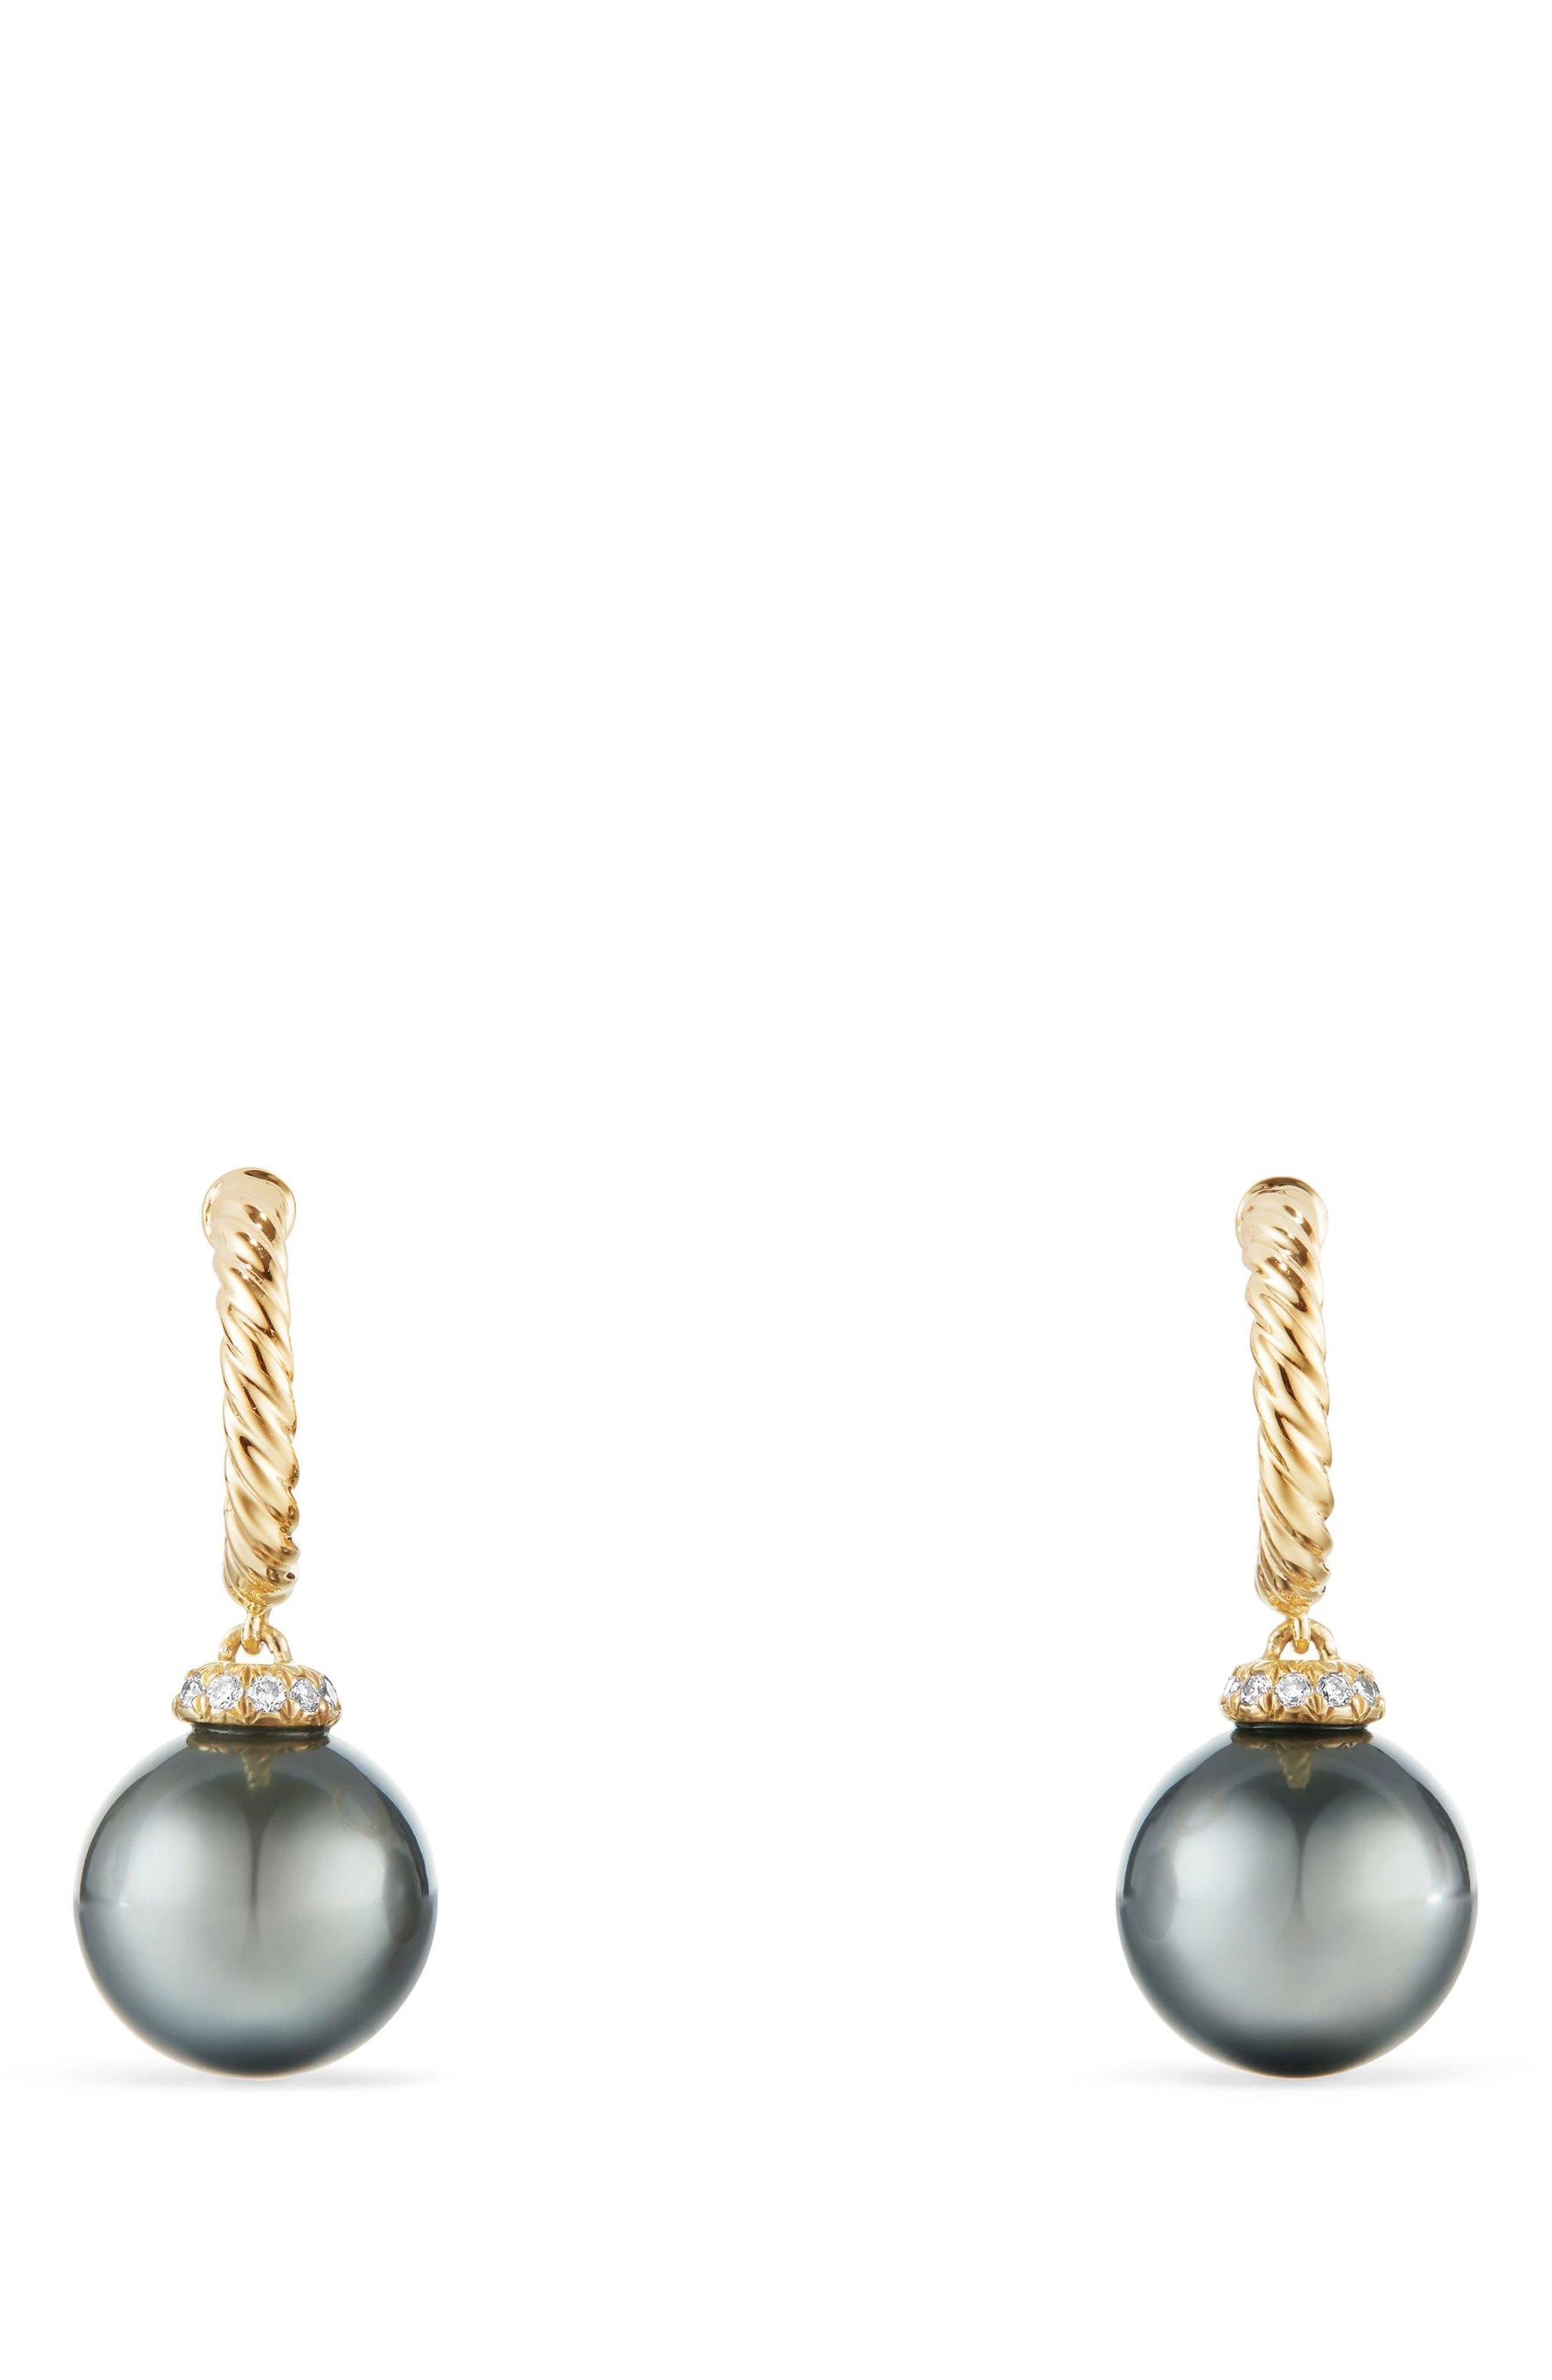 Solari Hoop Earrings with Diamonds and Genuine Pearl,                             Main thumbnail 1, color,                             GOLD/ DIAMOND/ GREY PEARL